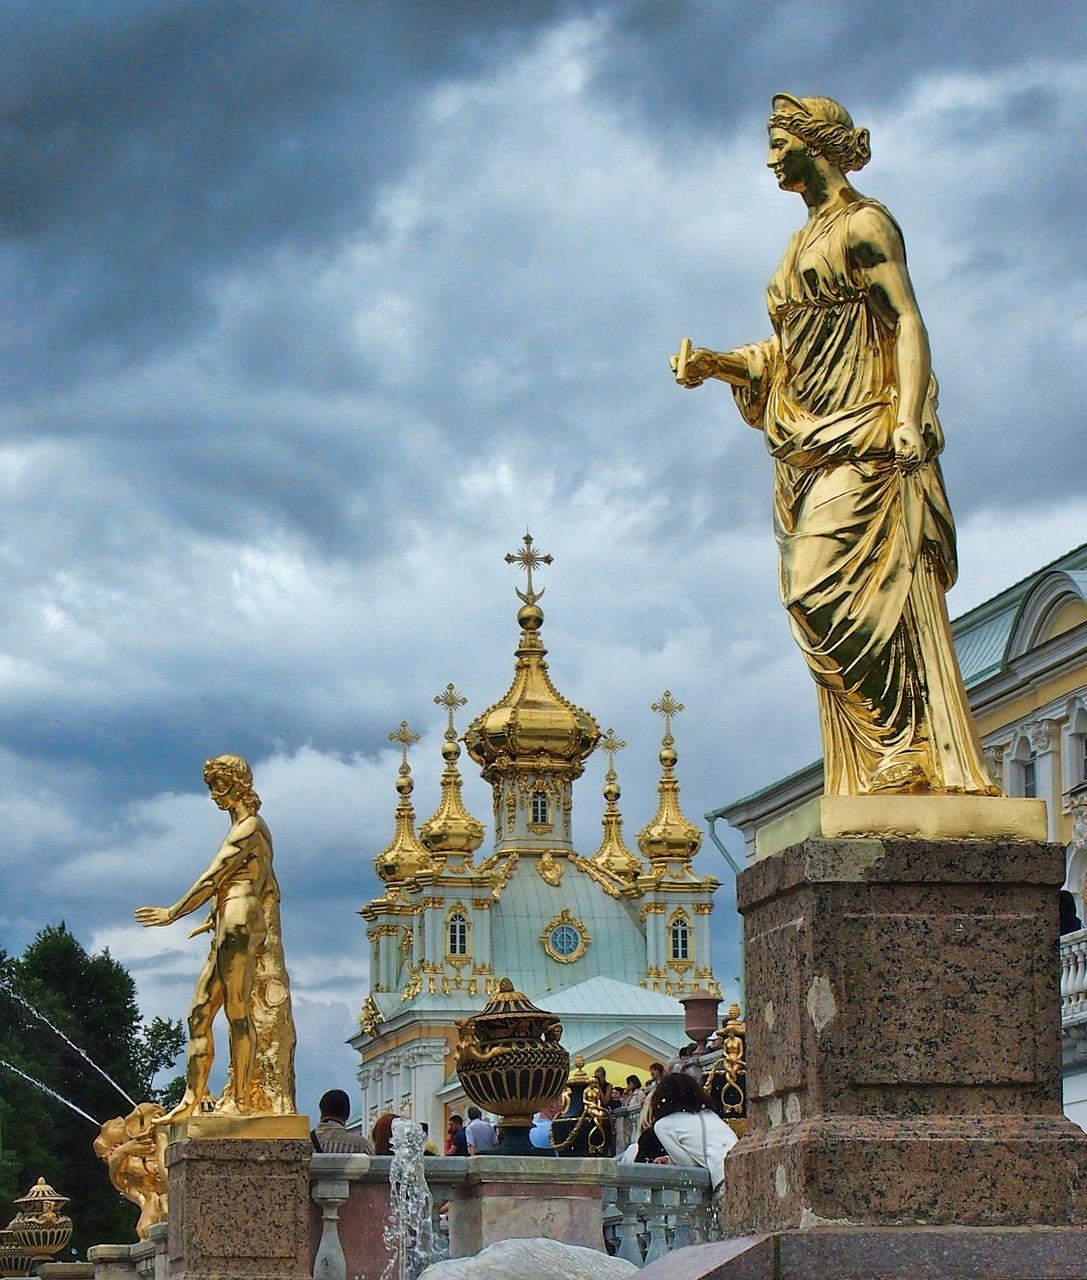 St. Petrsburg